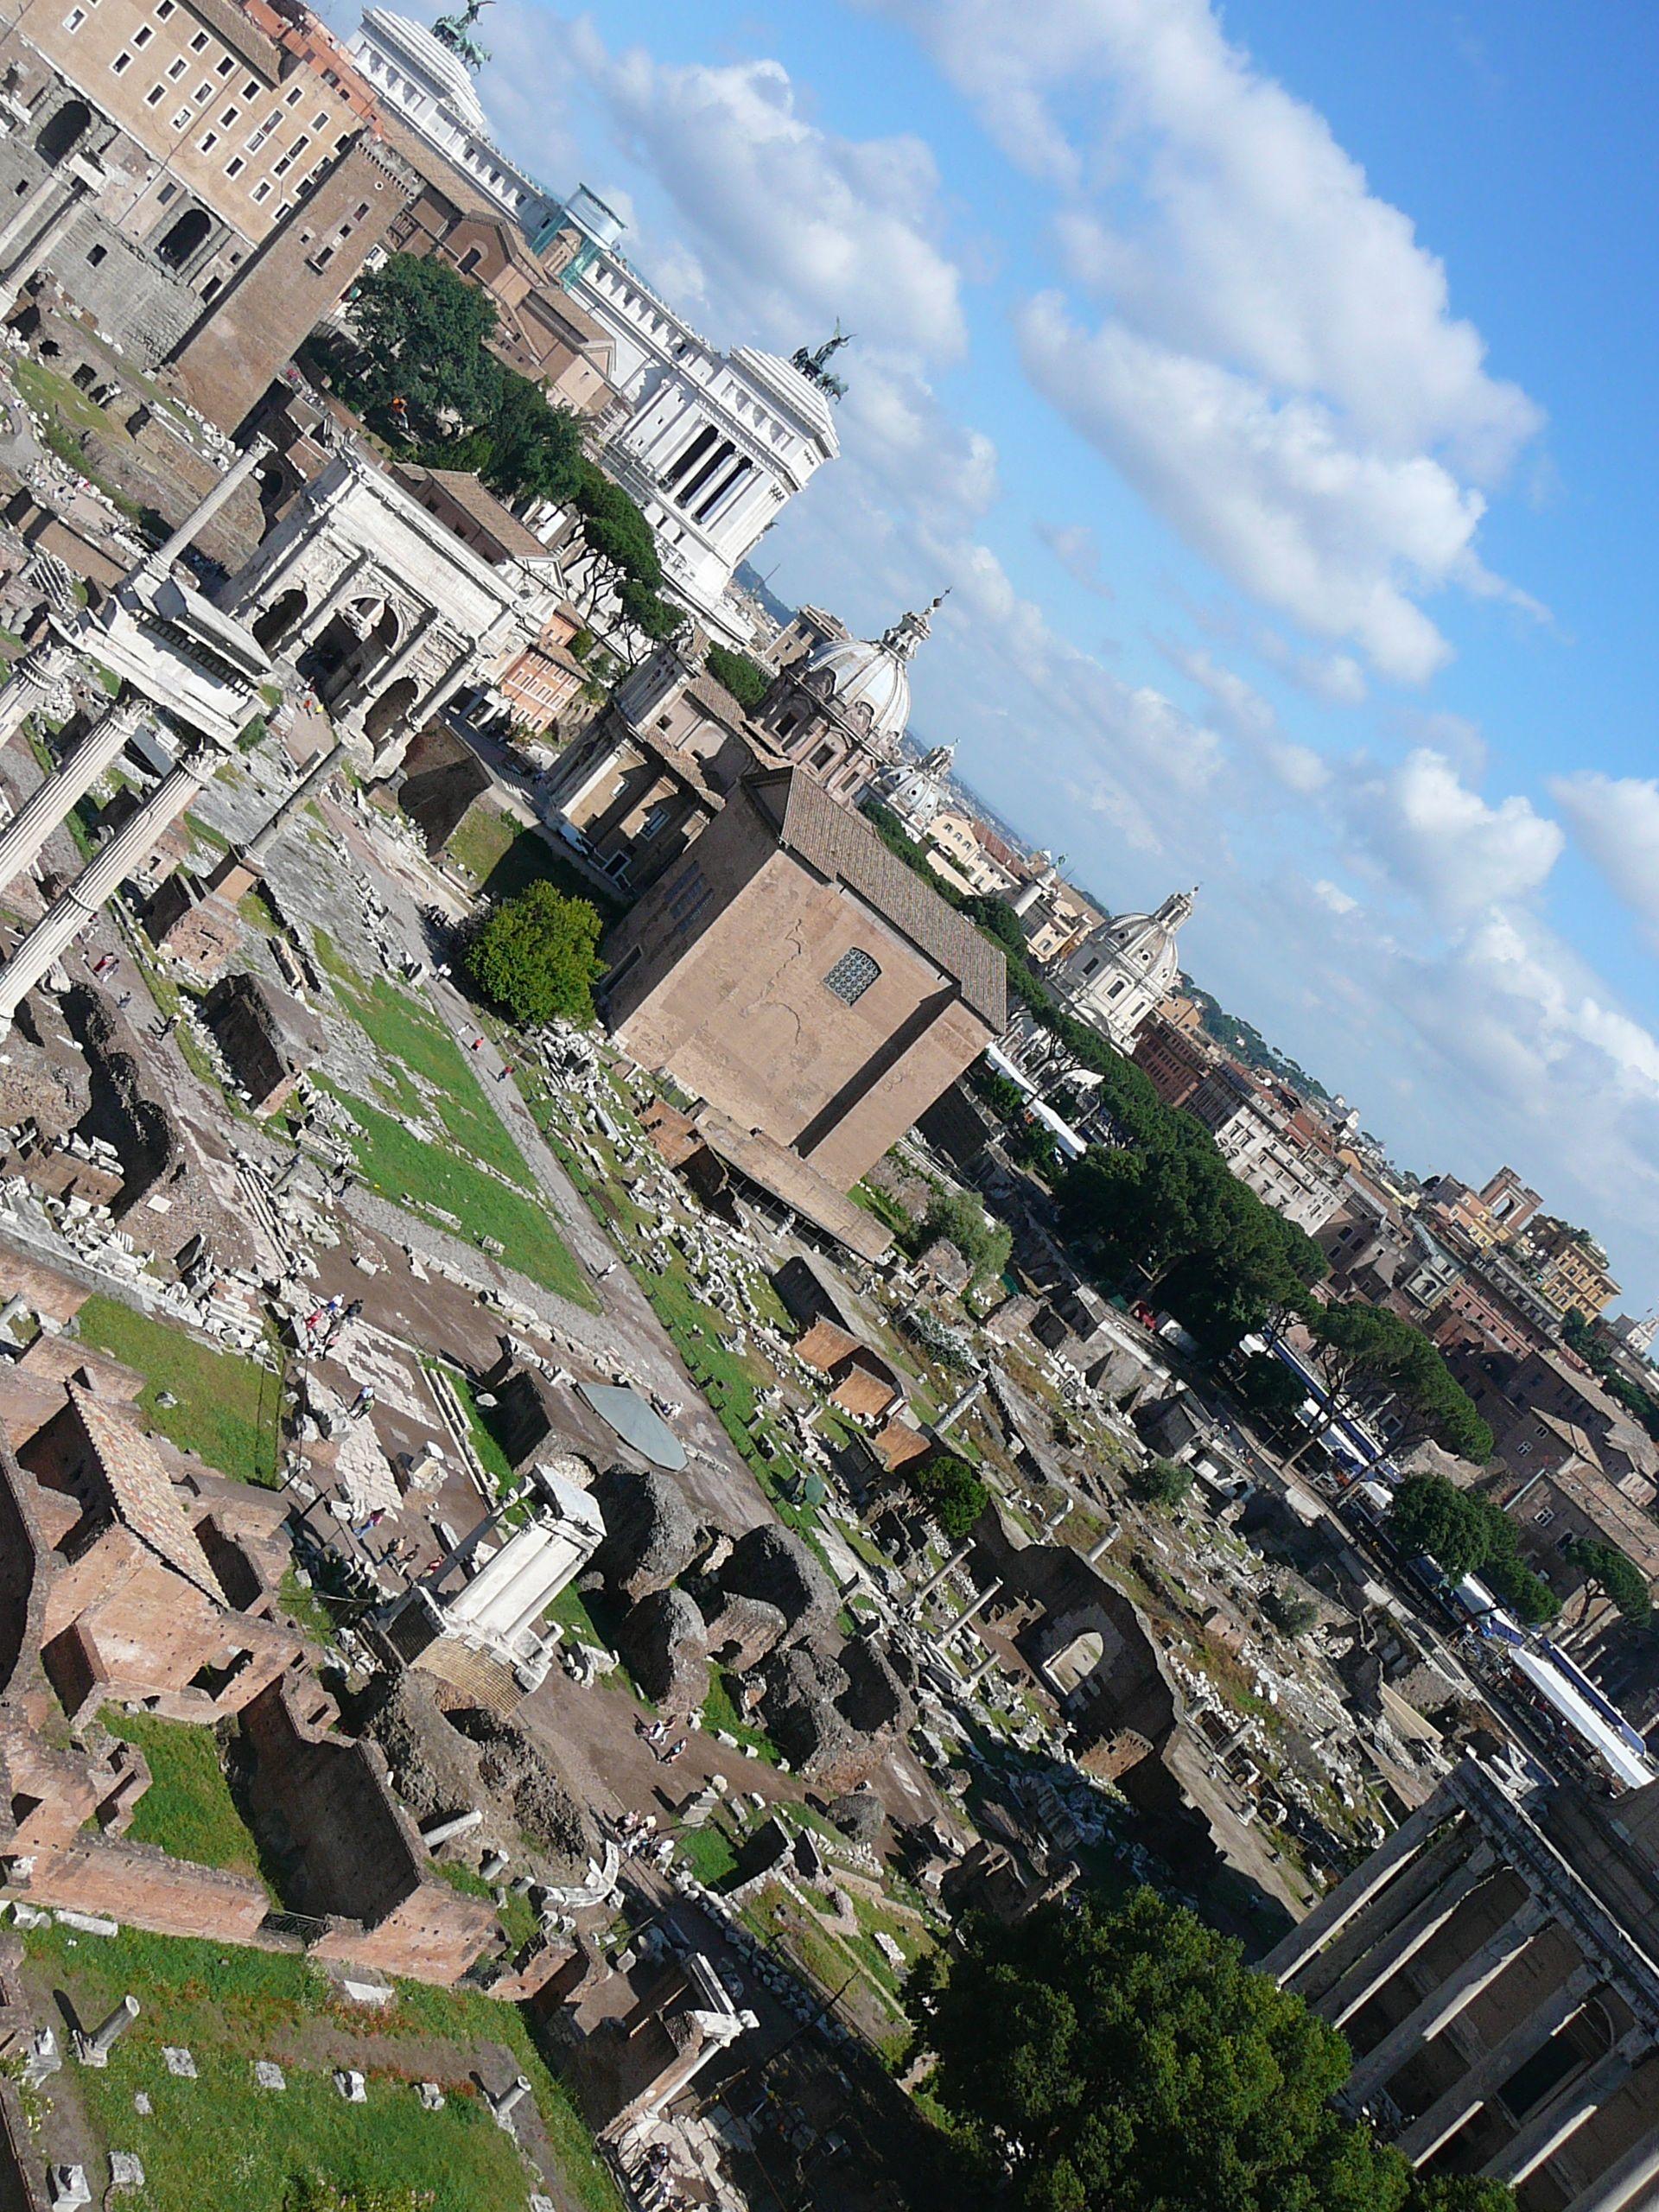 The Ancient Agora Rome, Italy Favorite places, Paris